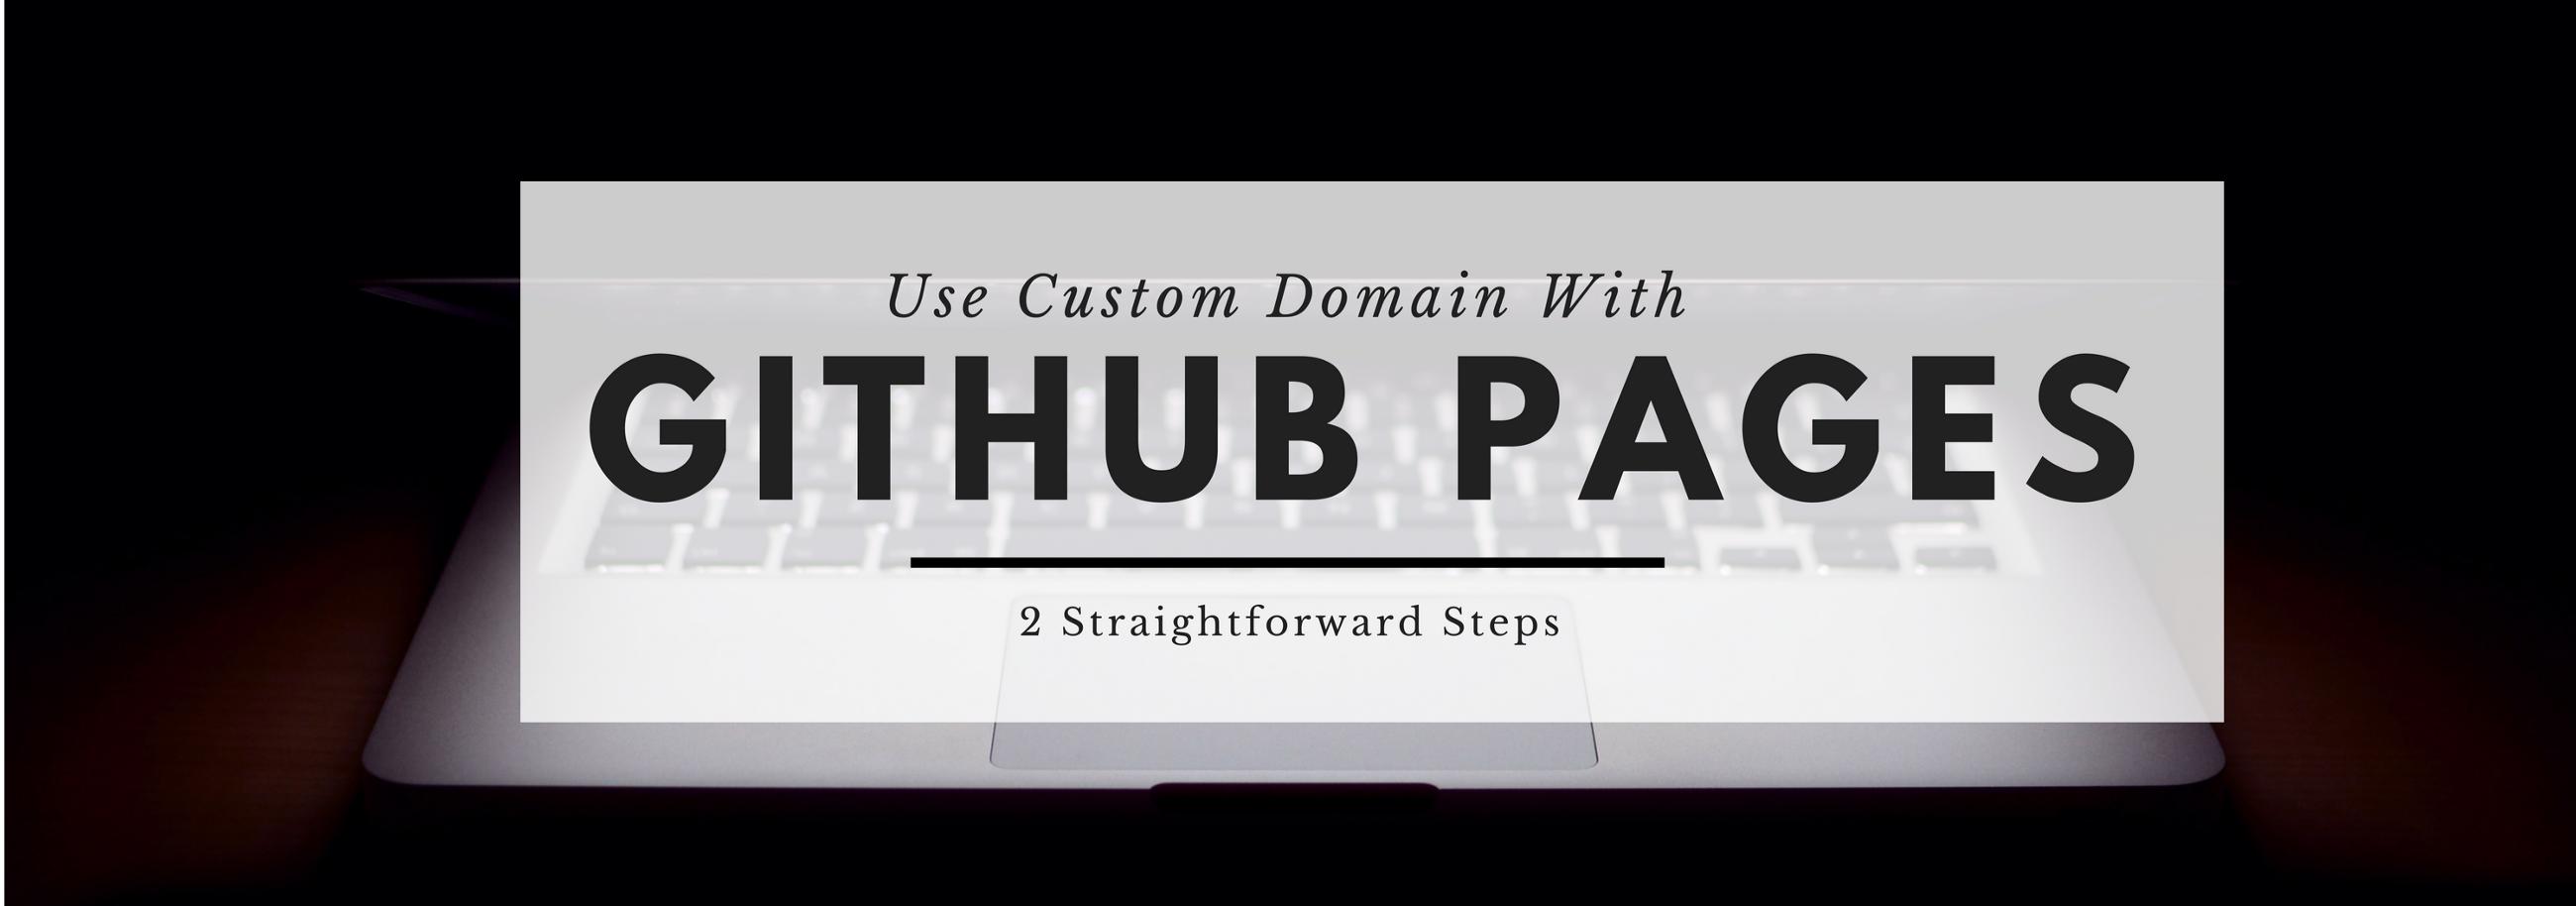 Use Custom Domain With GitHub Pages: 2 Straightforward Steps